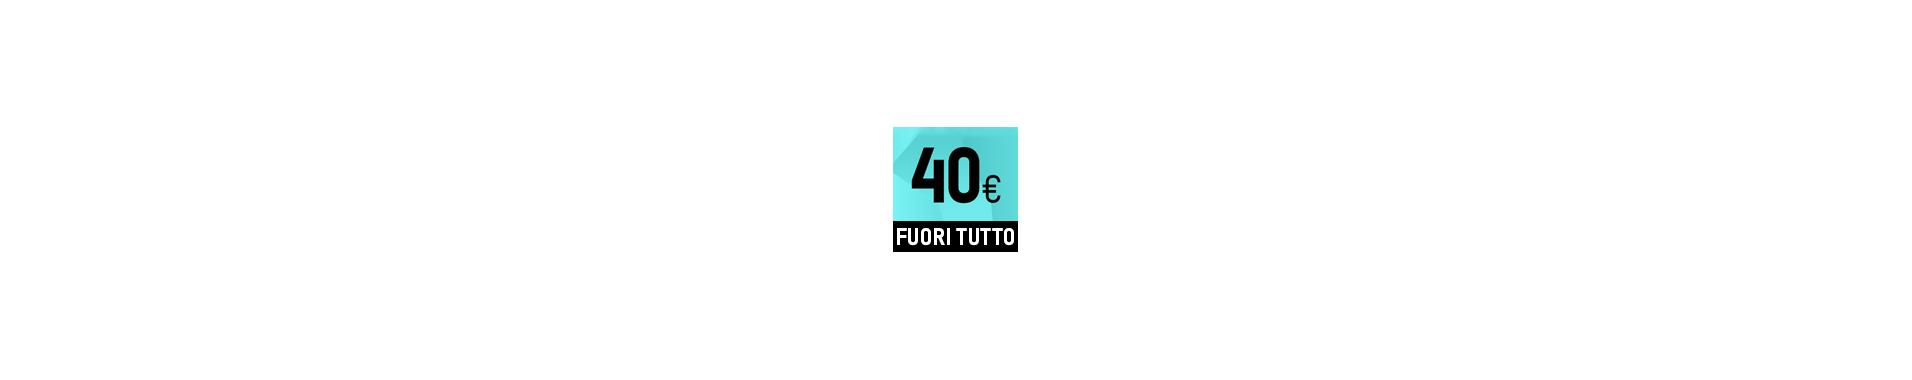 Caschi Moto a € 40